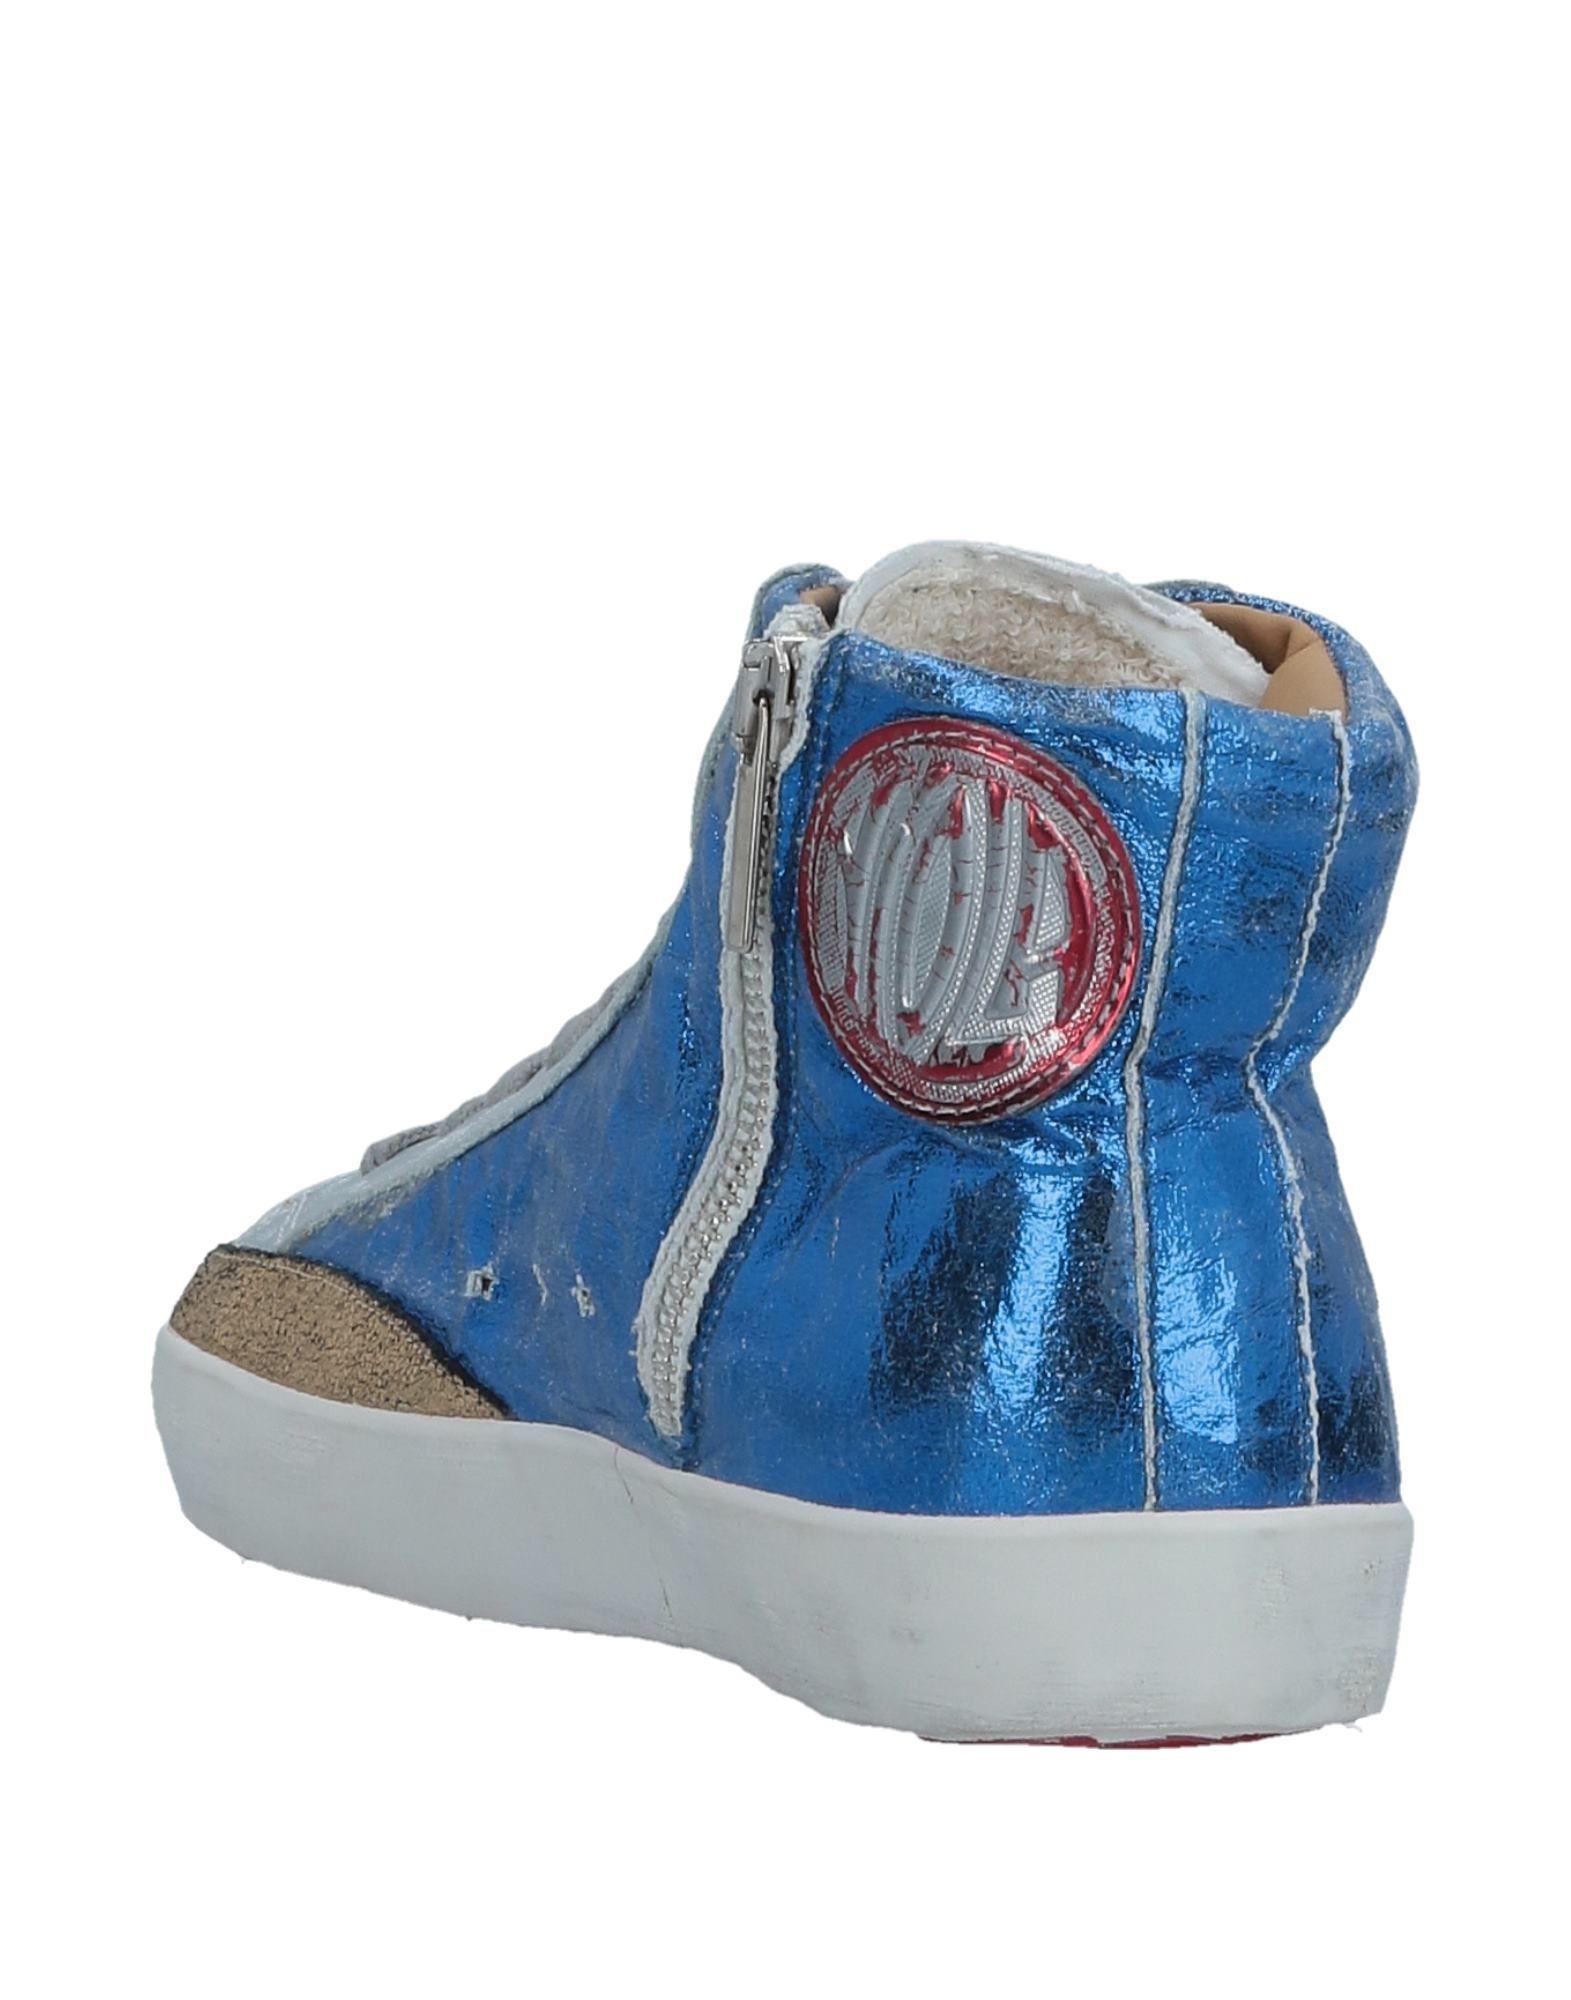 Ishikawa Leather High-tops & Sneakers in Blue